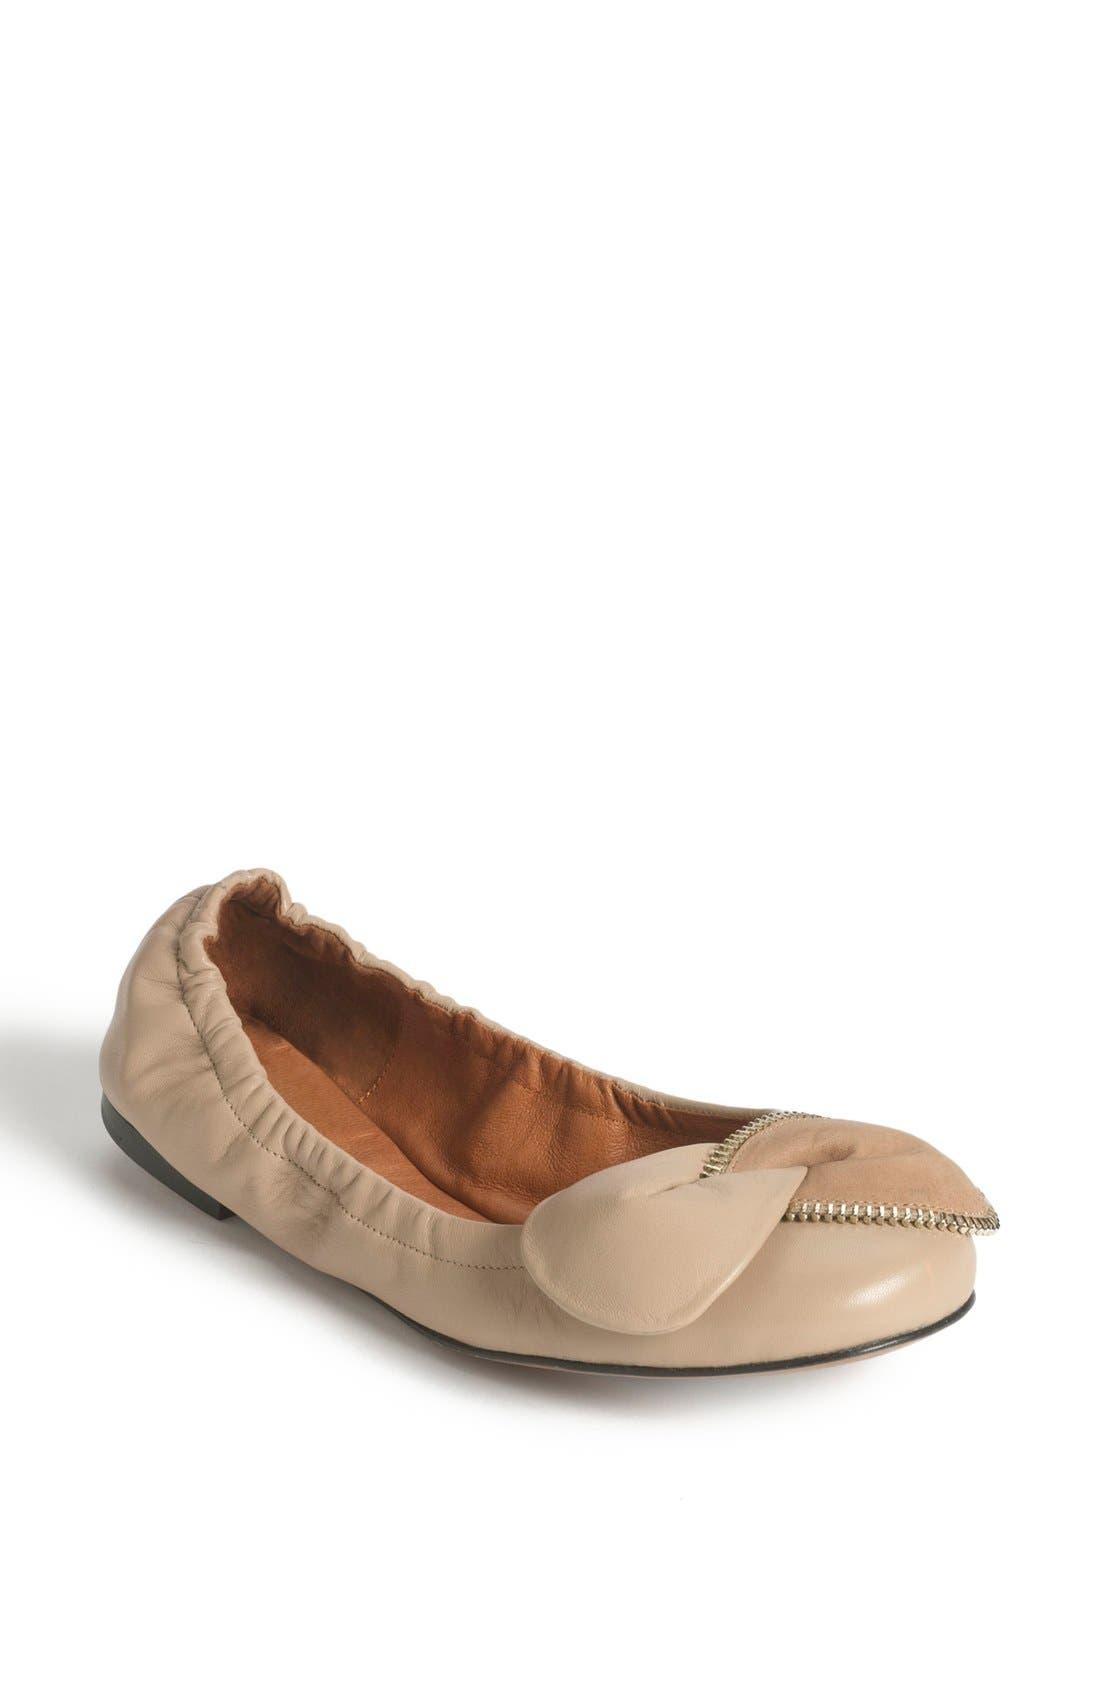 Main Image - See by Chloé 'Clara' Ballerina Flat